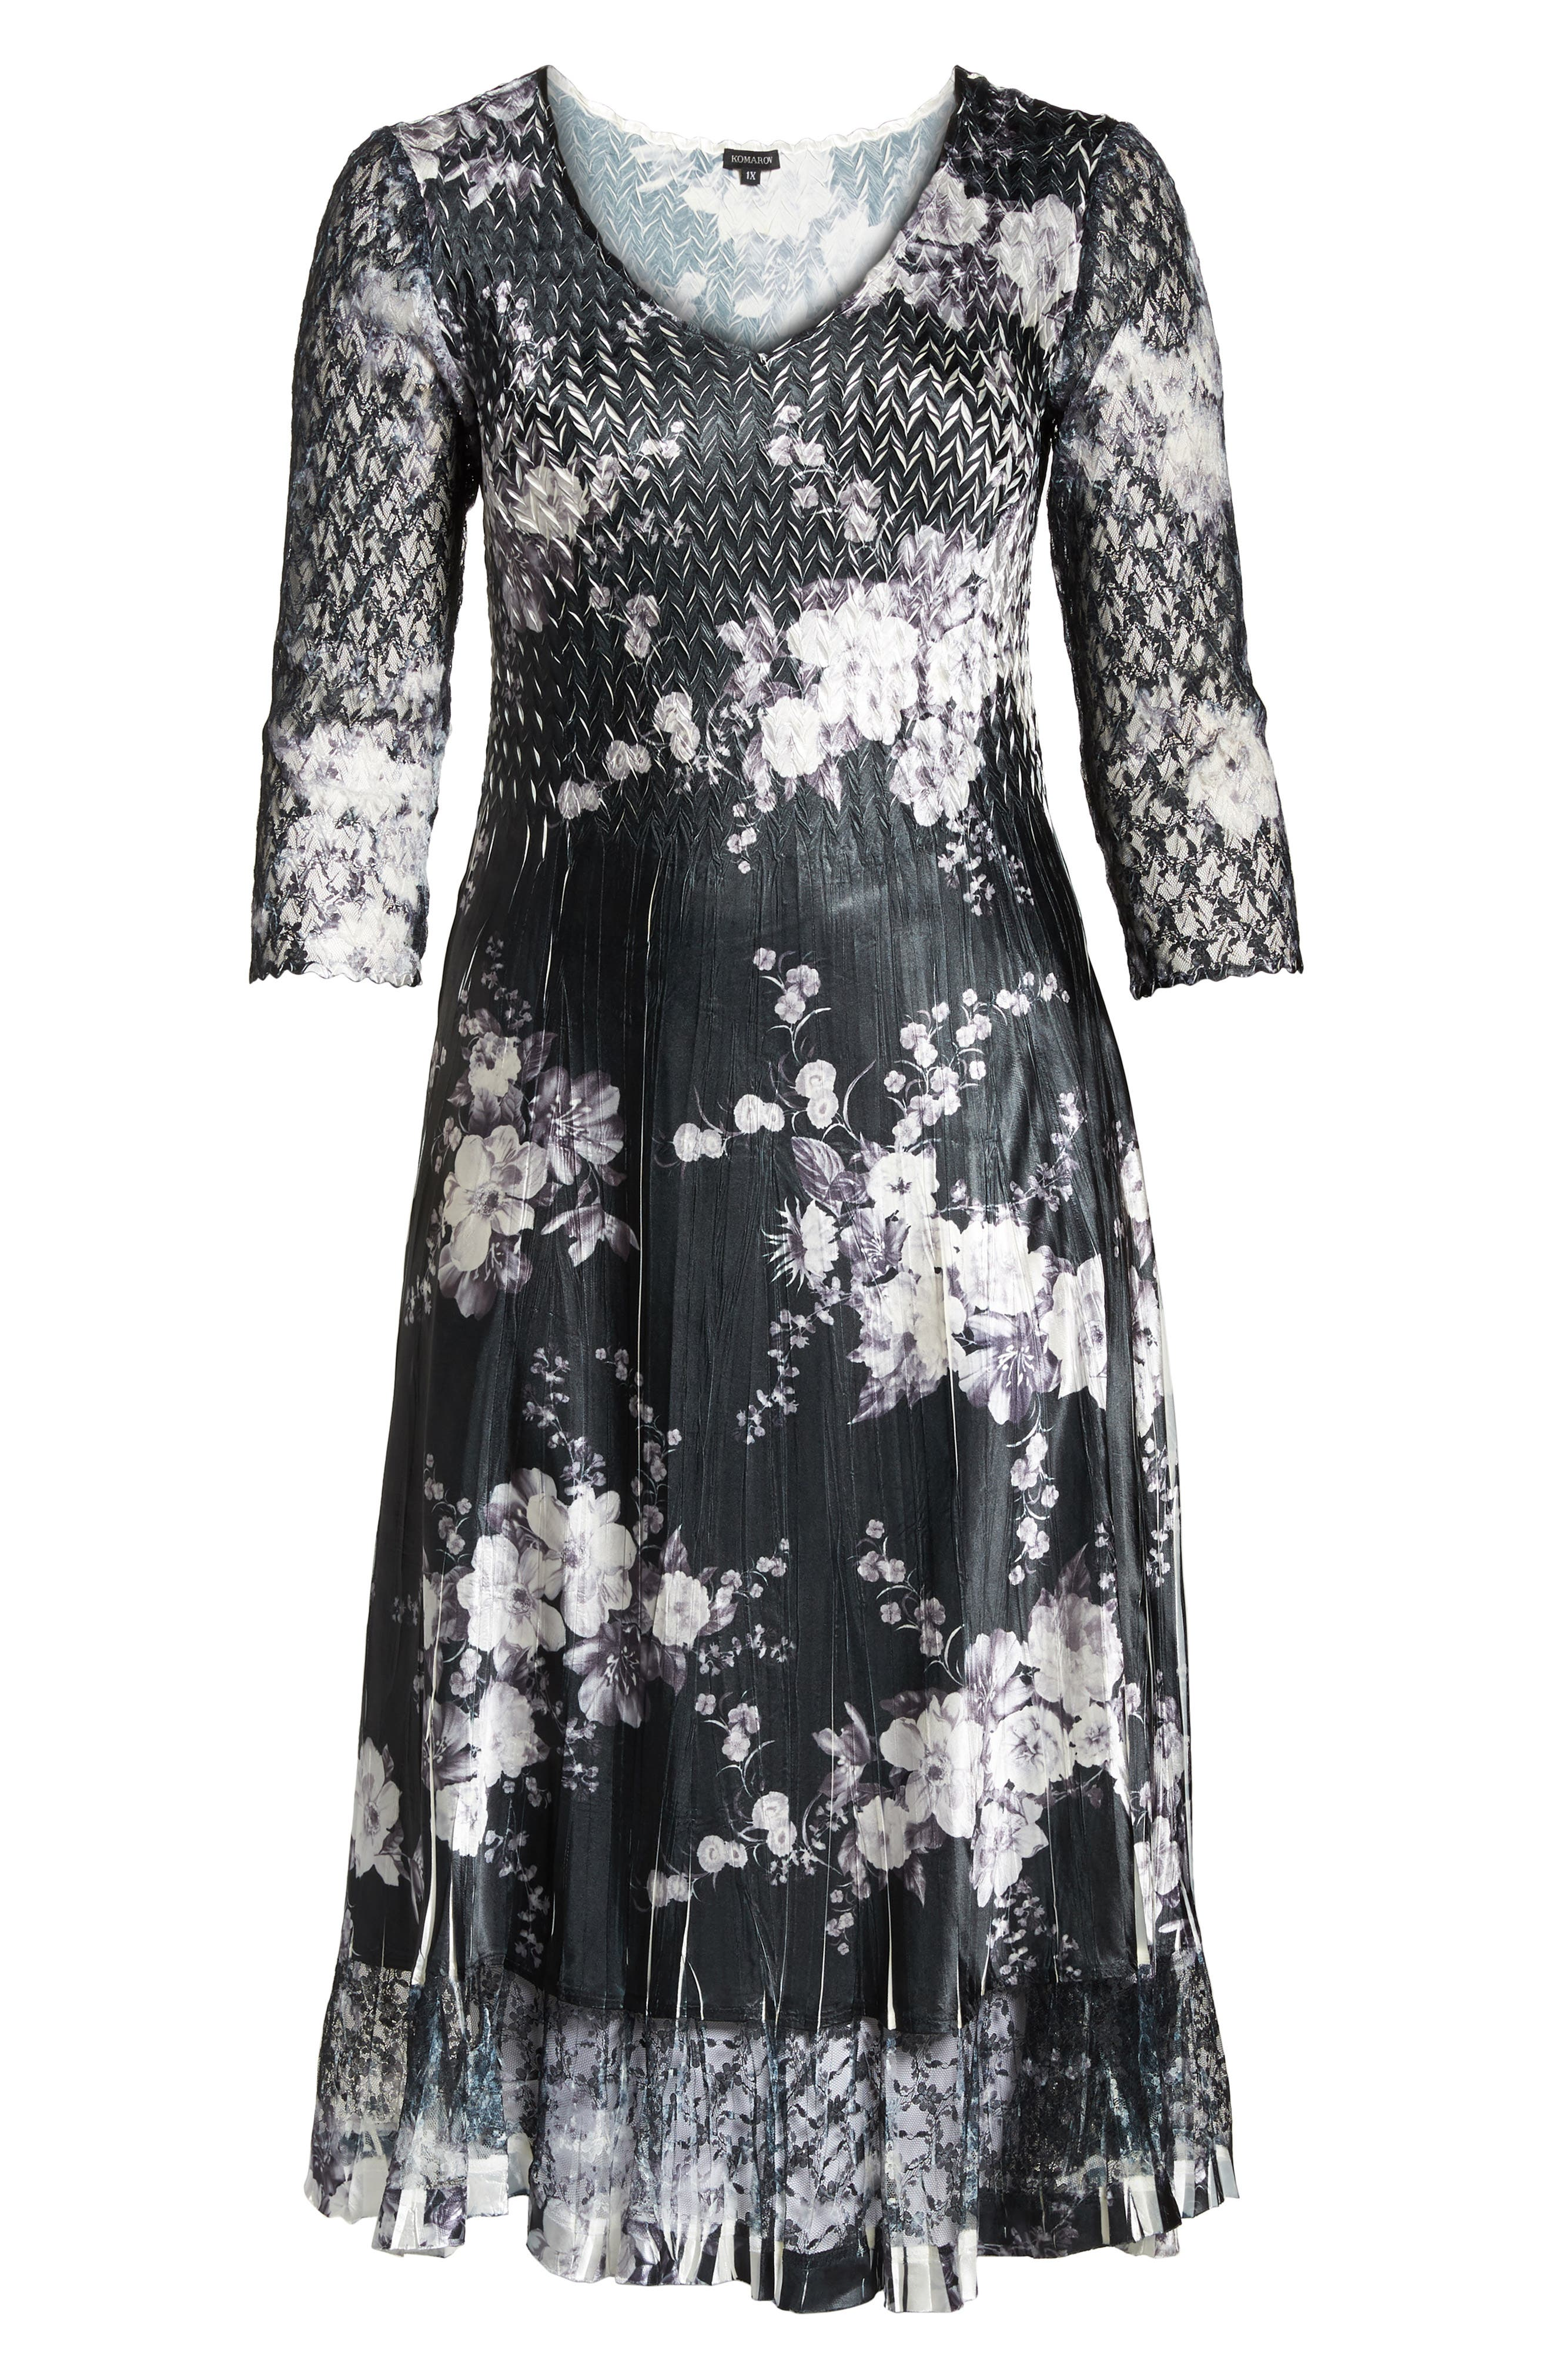 Lace & Charmeuse A-Line Dress,                             Alternate thumbnail 6, color,                             001